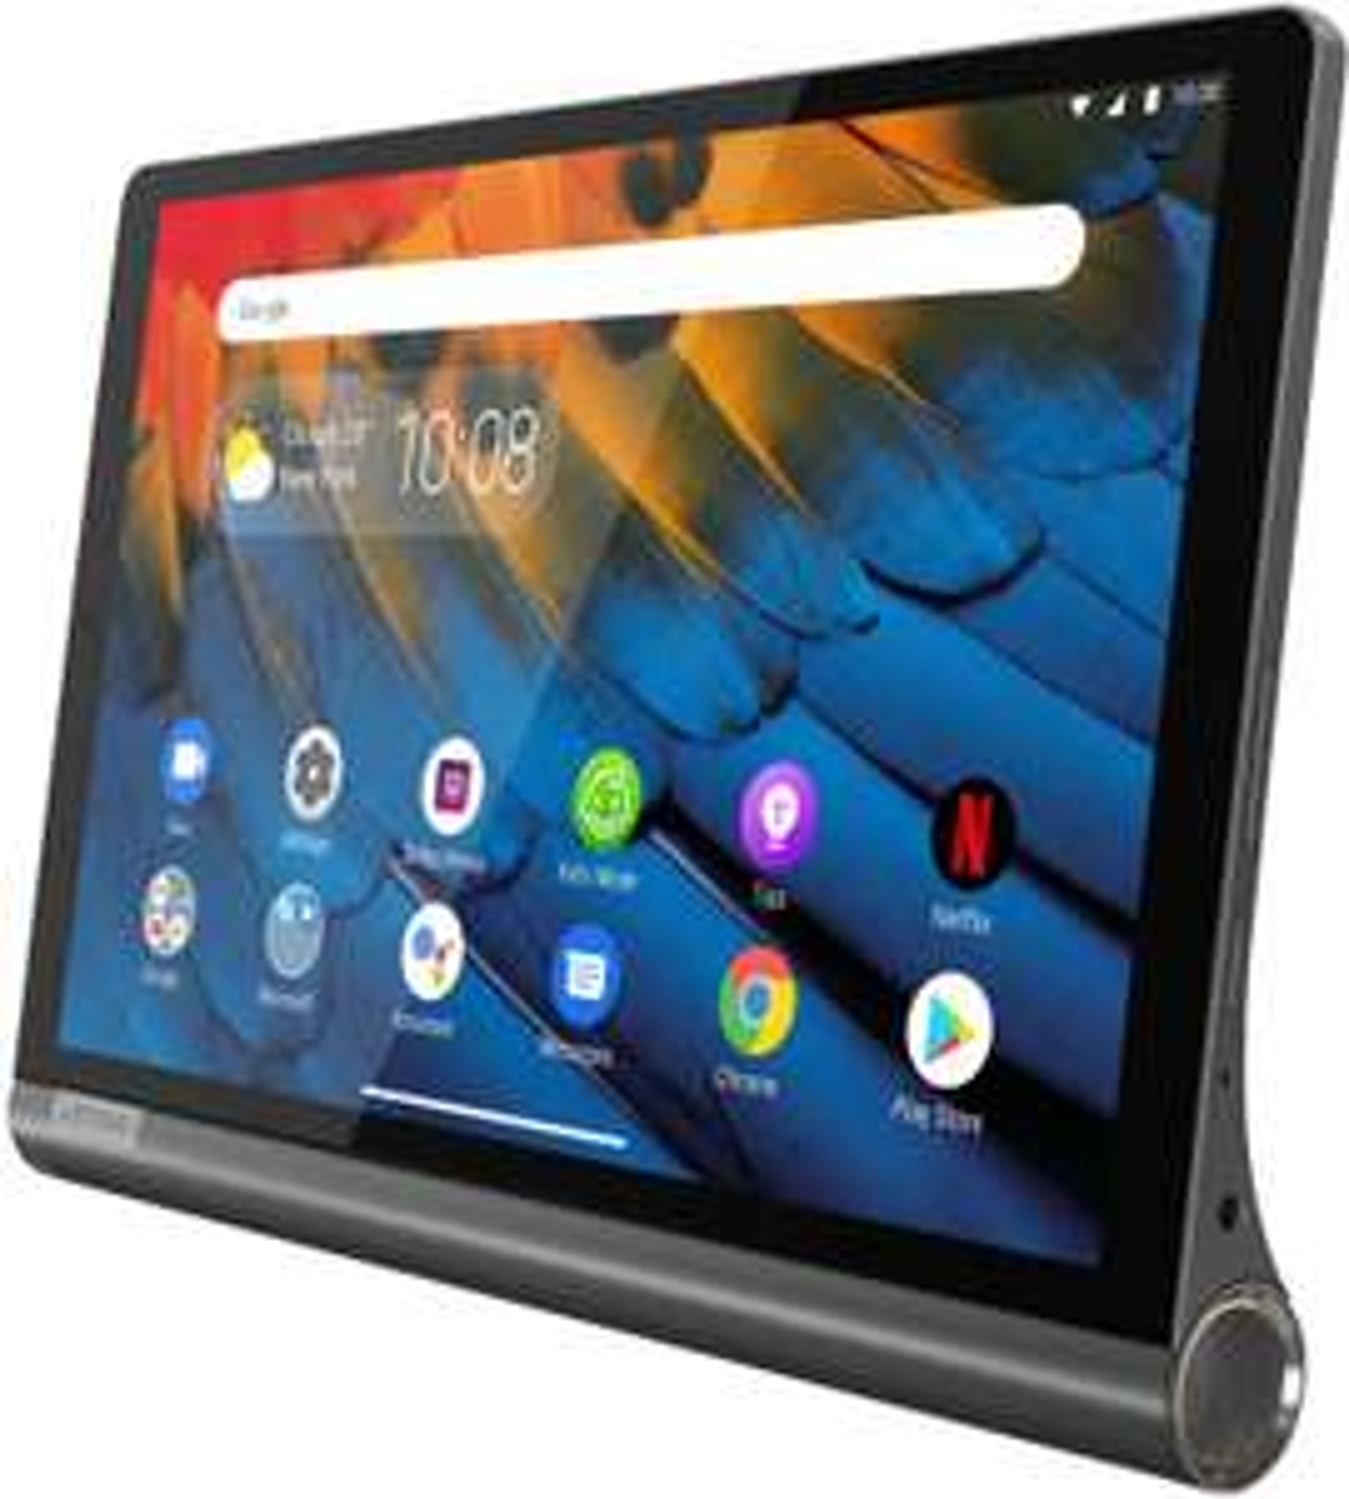 "Lenovo Yoga Smart Tab (10.1"", IPS, 1920x1200, 320cd/m², SD 439, 4GB RAM, 64GB + microSD, USB-C, Stereo-LS, Ständer, 7000mAh, Android 9.0)"